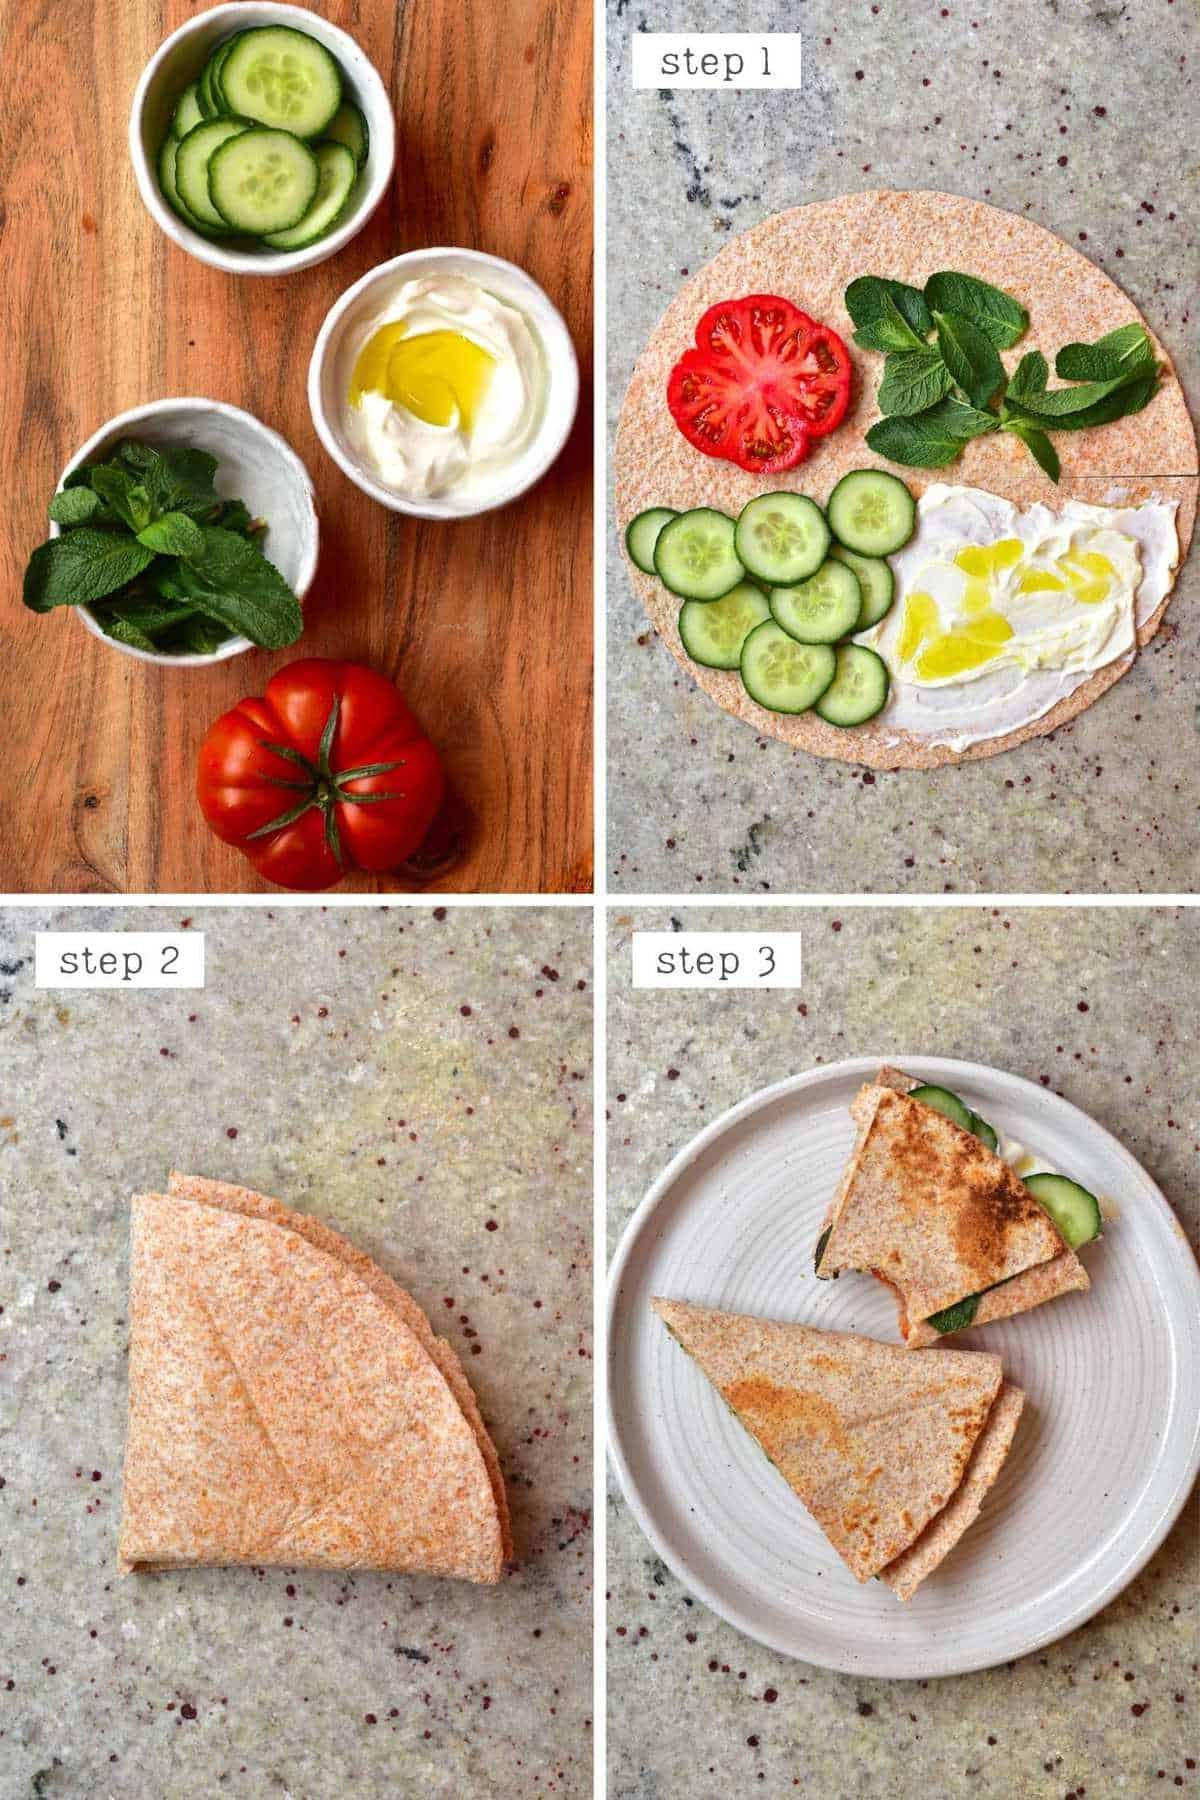 Steps for making labneh breakfast wrap